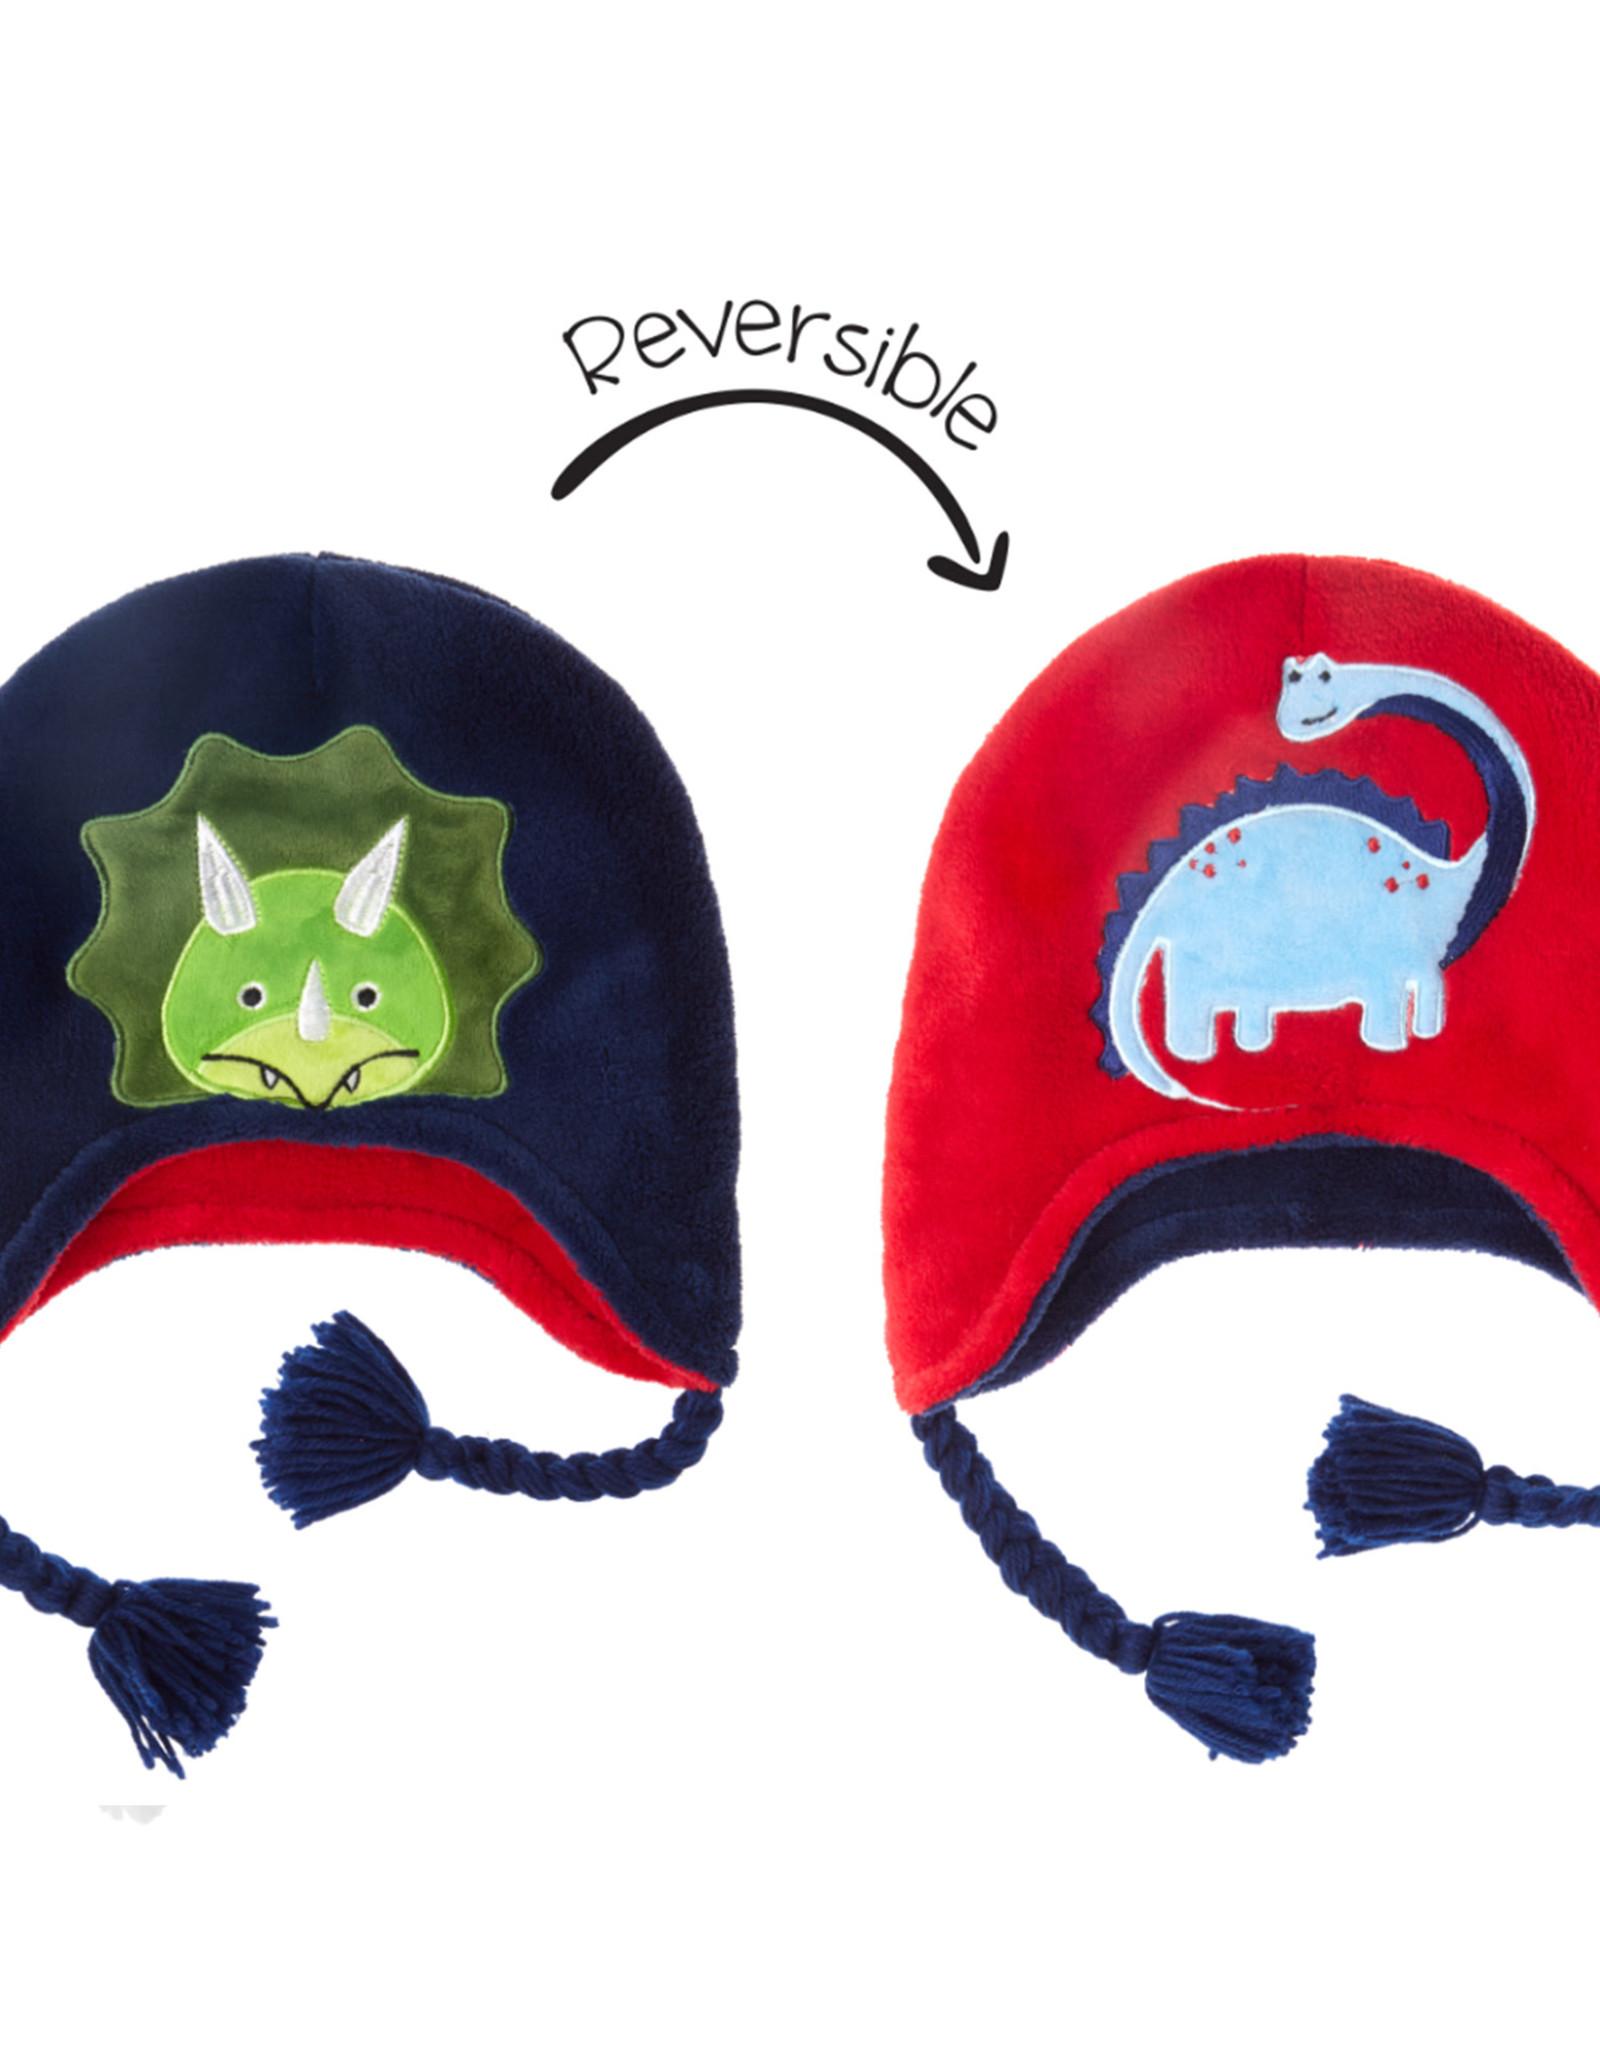 FlapJackKids FlapJackKids Reversible Fleece Hat - Dinosaur - Baby/Toddler